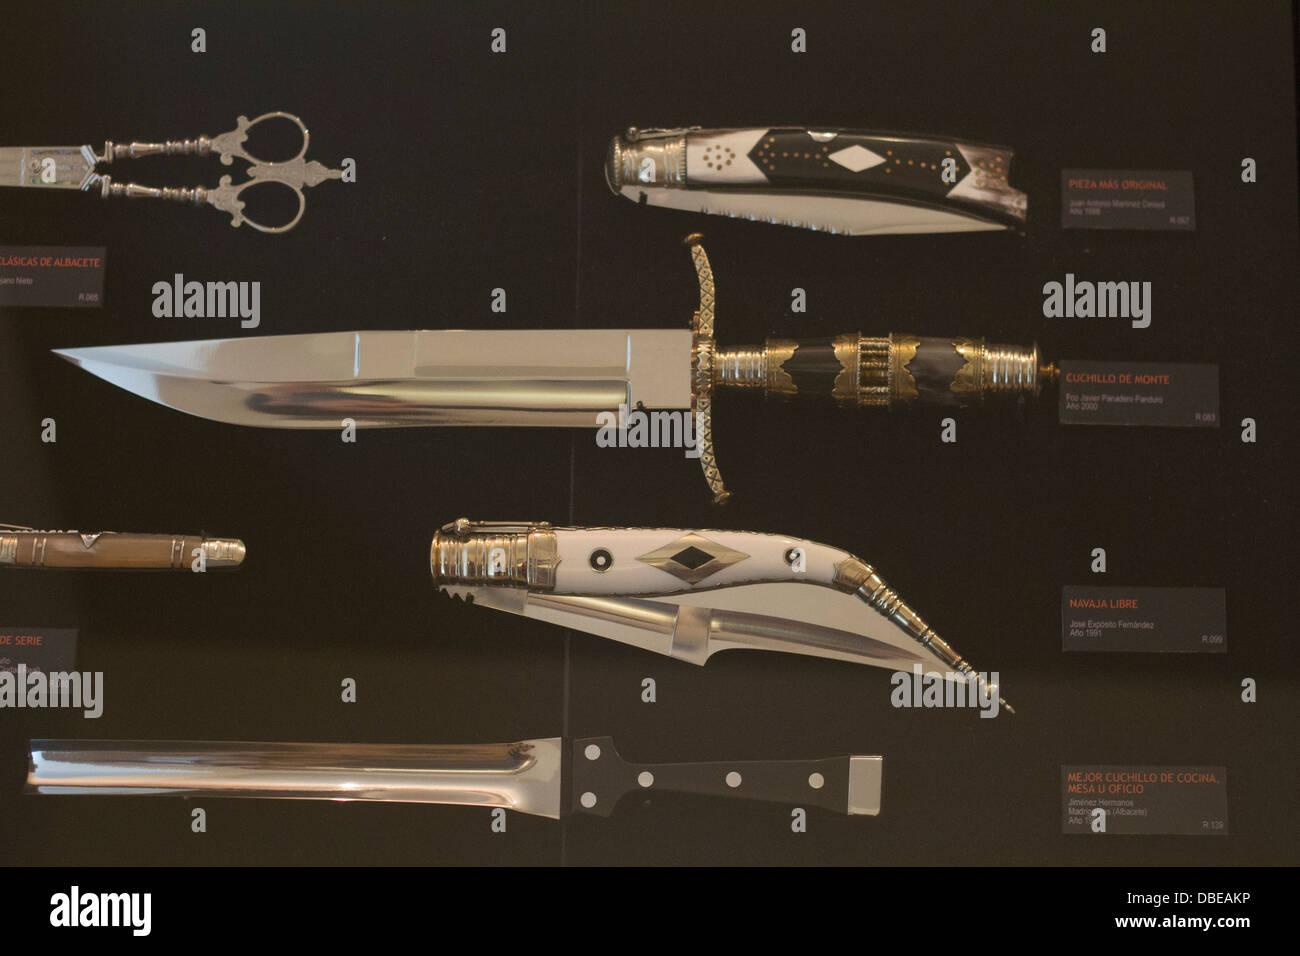 Pocket knife's museum in Albacete, Castilla La Mancha, Spain. - Stock Image